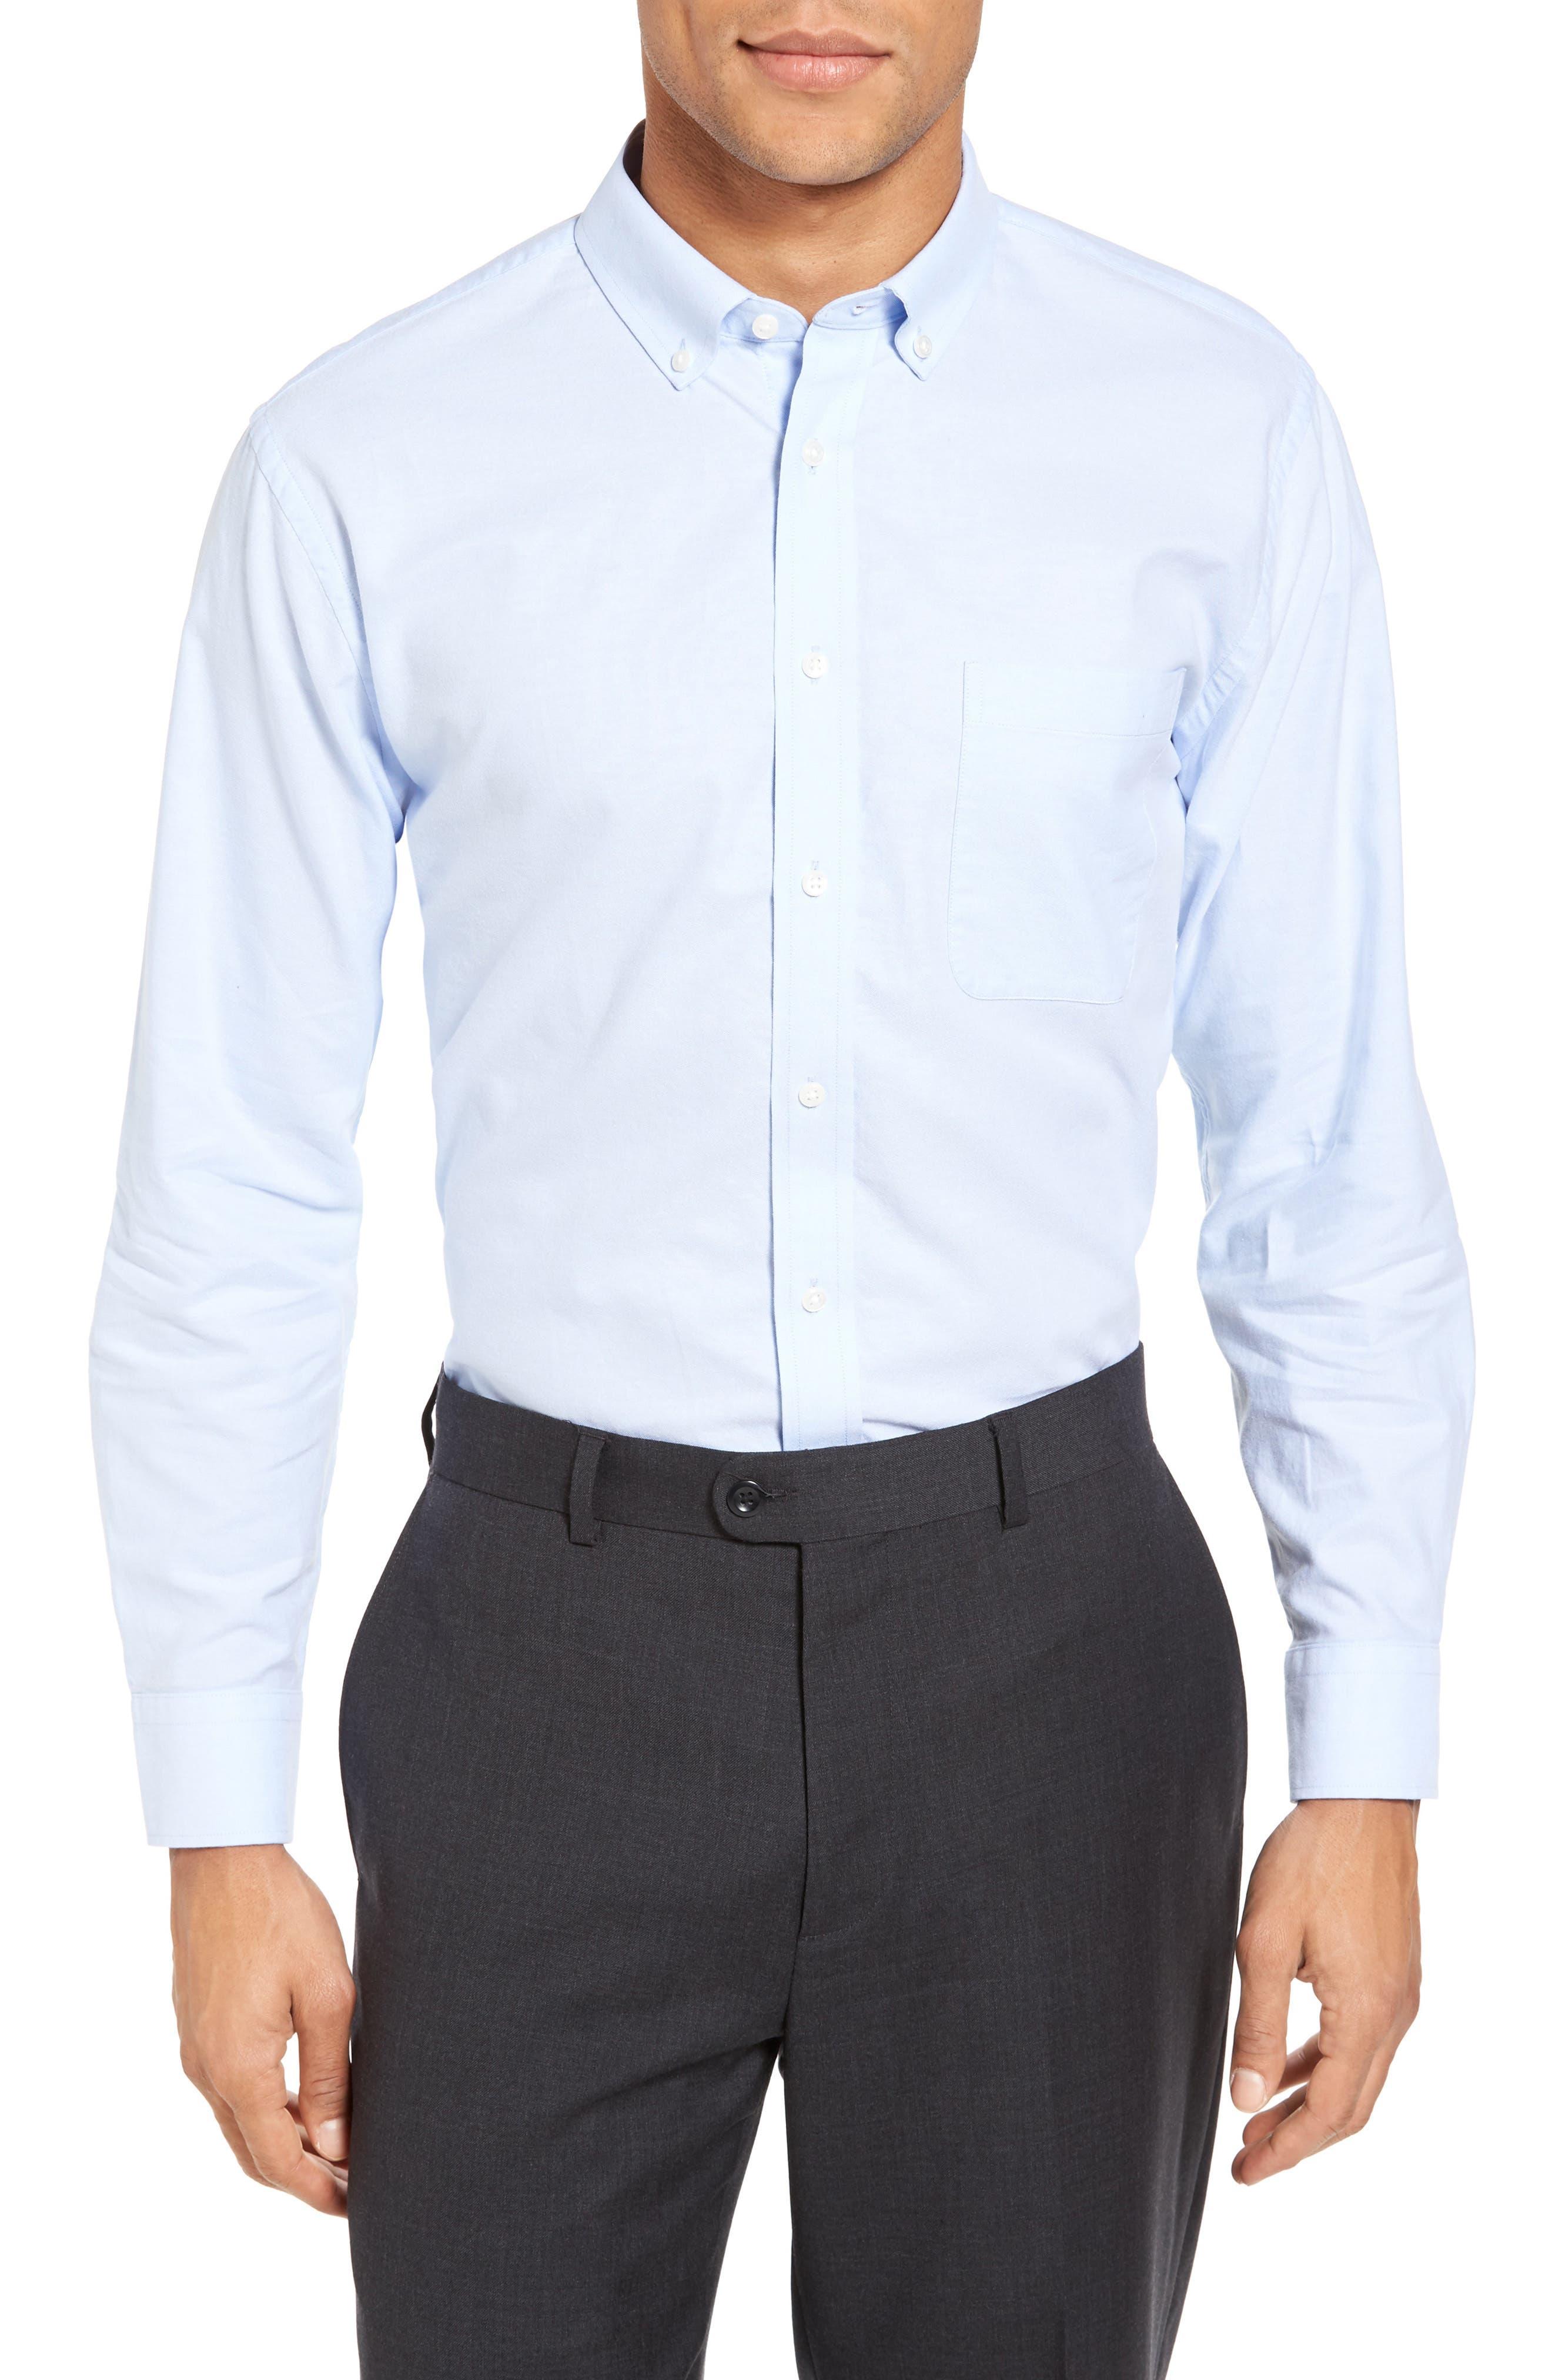 Trim Fit Solid Oxford Dress Shirt,                             Alternate thumbnail 5, color,